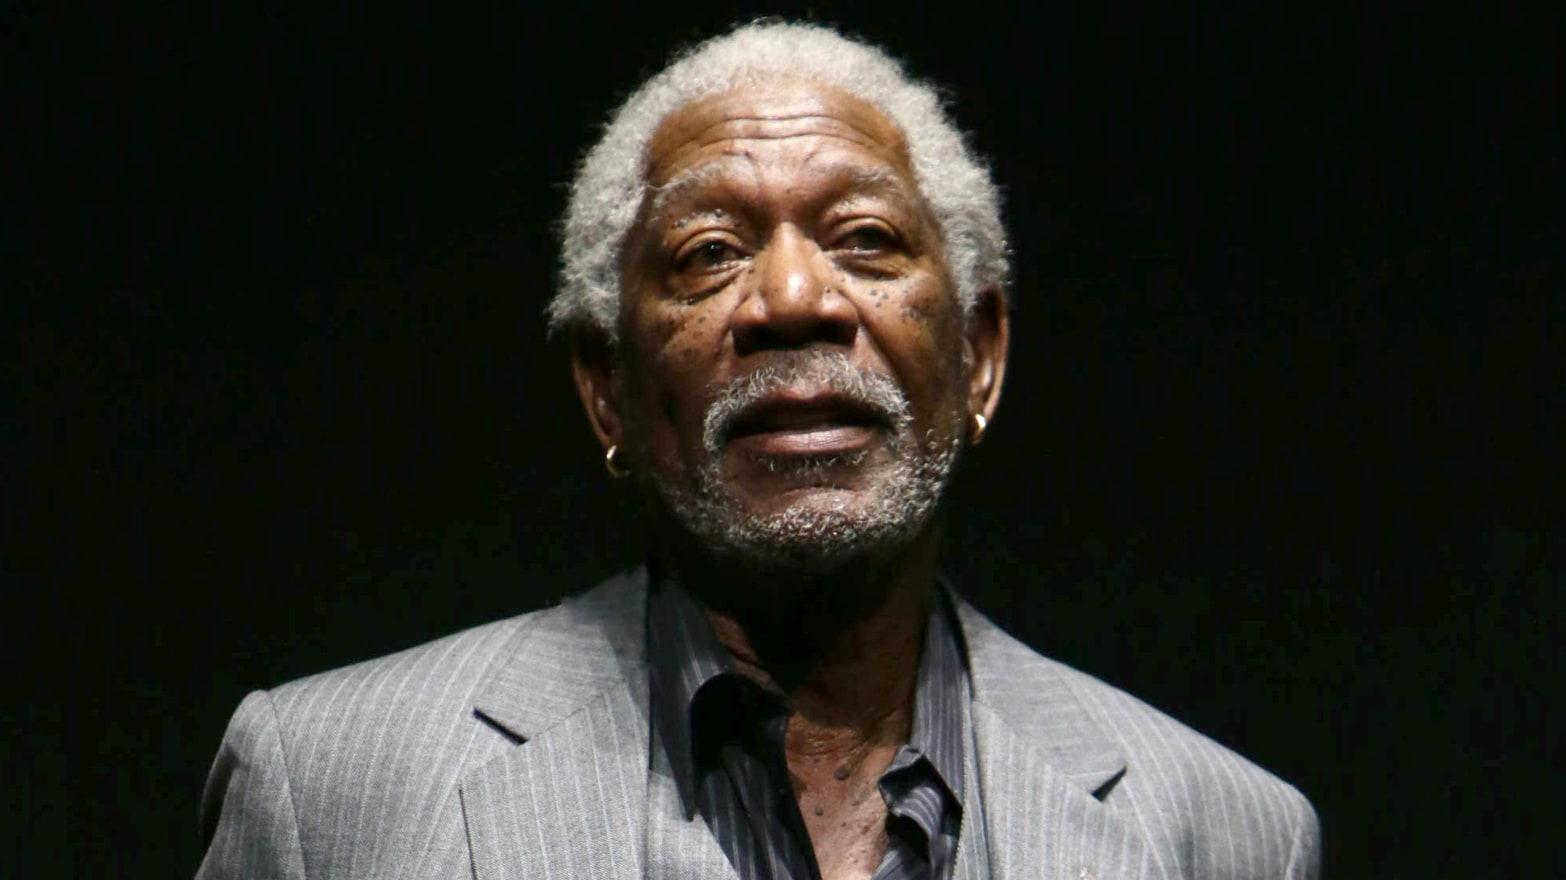 Morgan Freeman On Baltimore Protest Coverage F Ck The Media